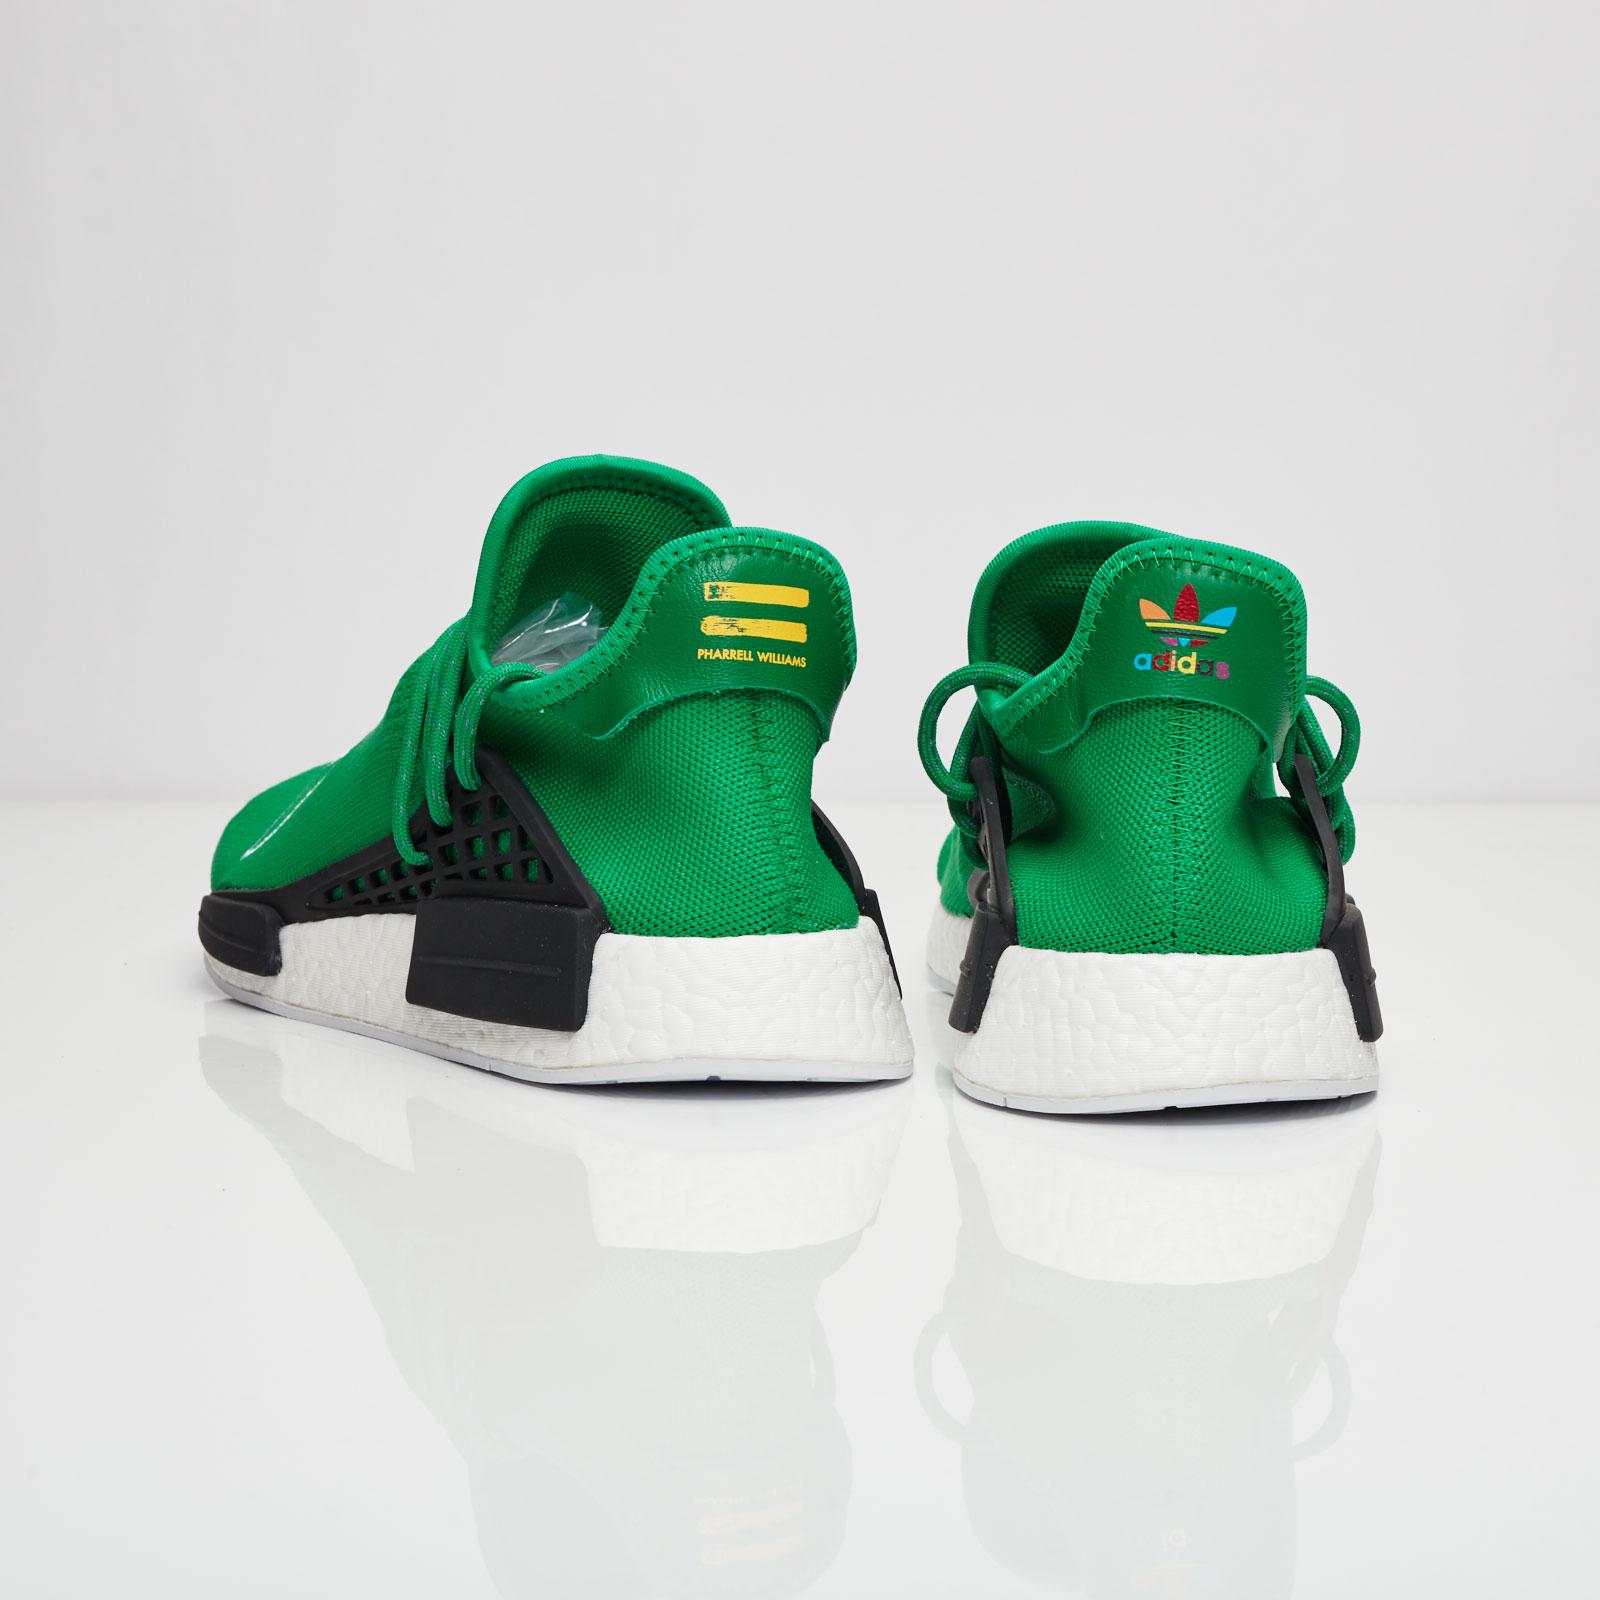 53f56e00a5c5d adidas PW Human Race NMD - Bb0620 - Sneakersnstuff